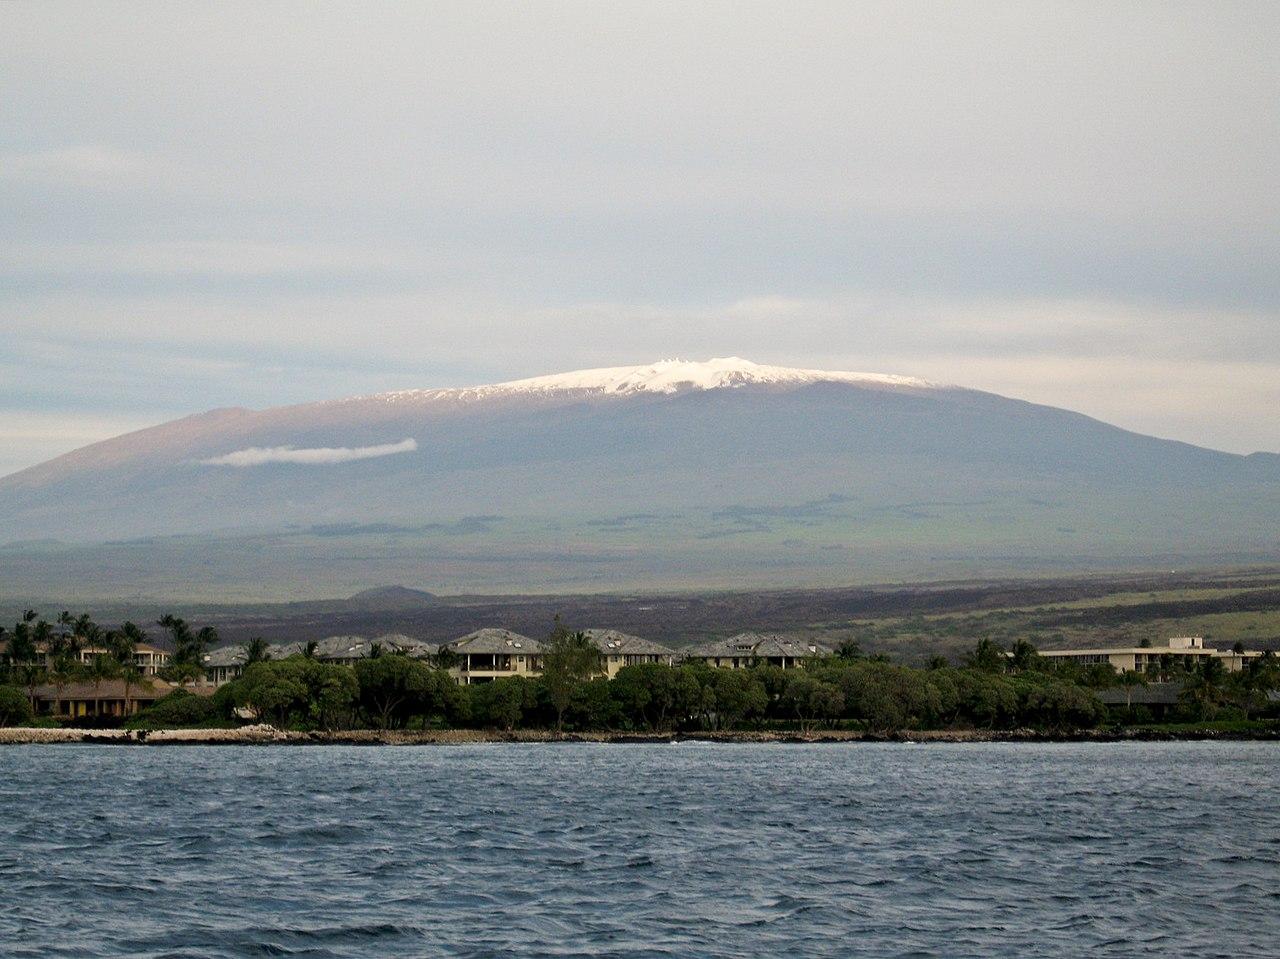 mount-Mauna_Kea_from_the_ocean.jpg